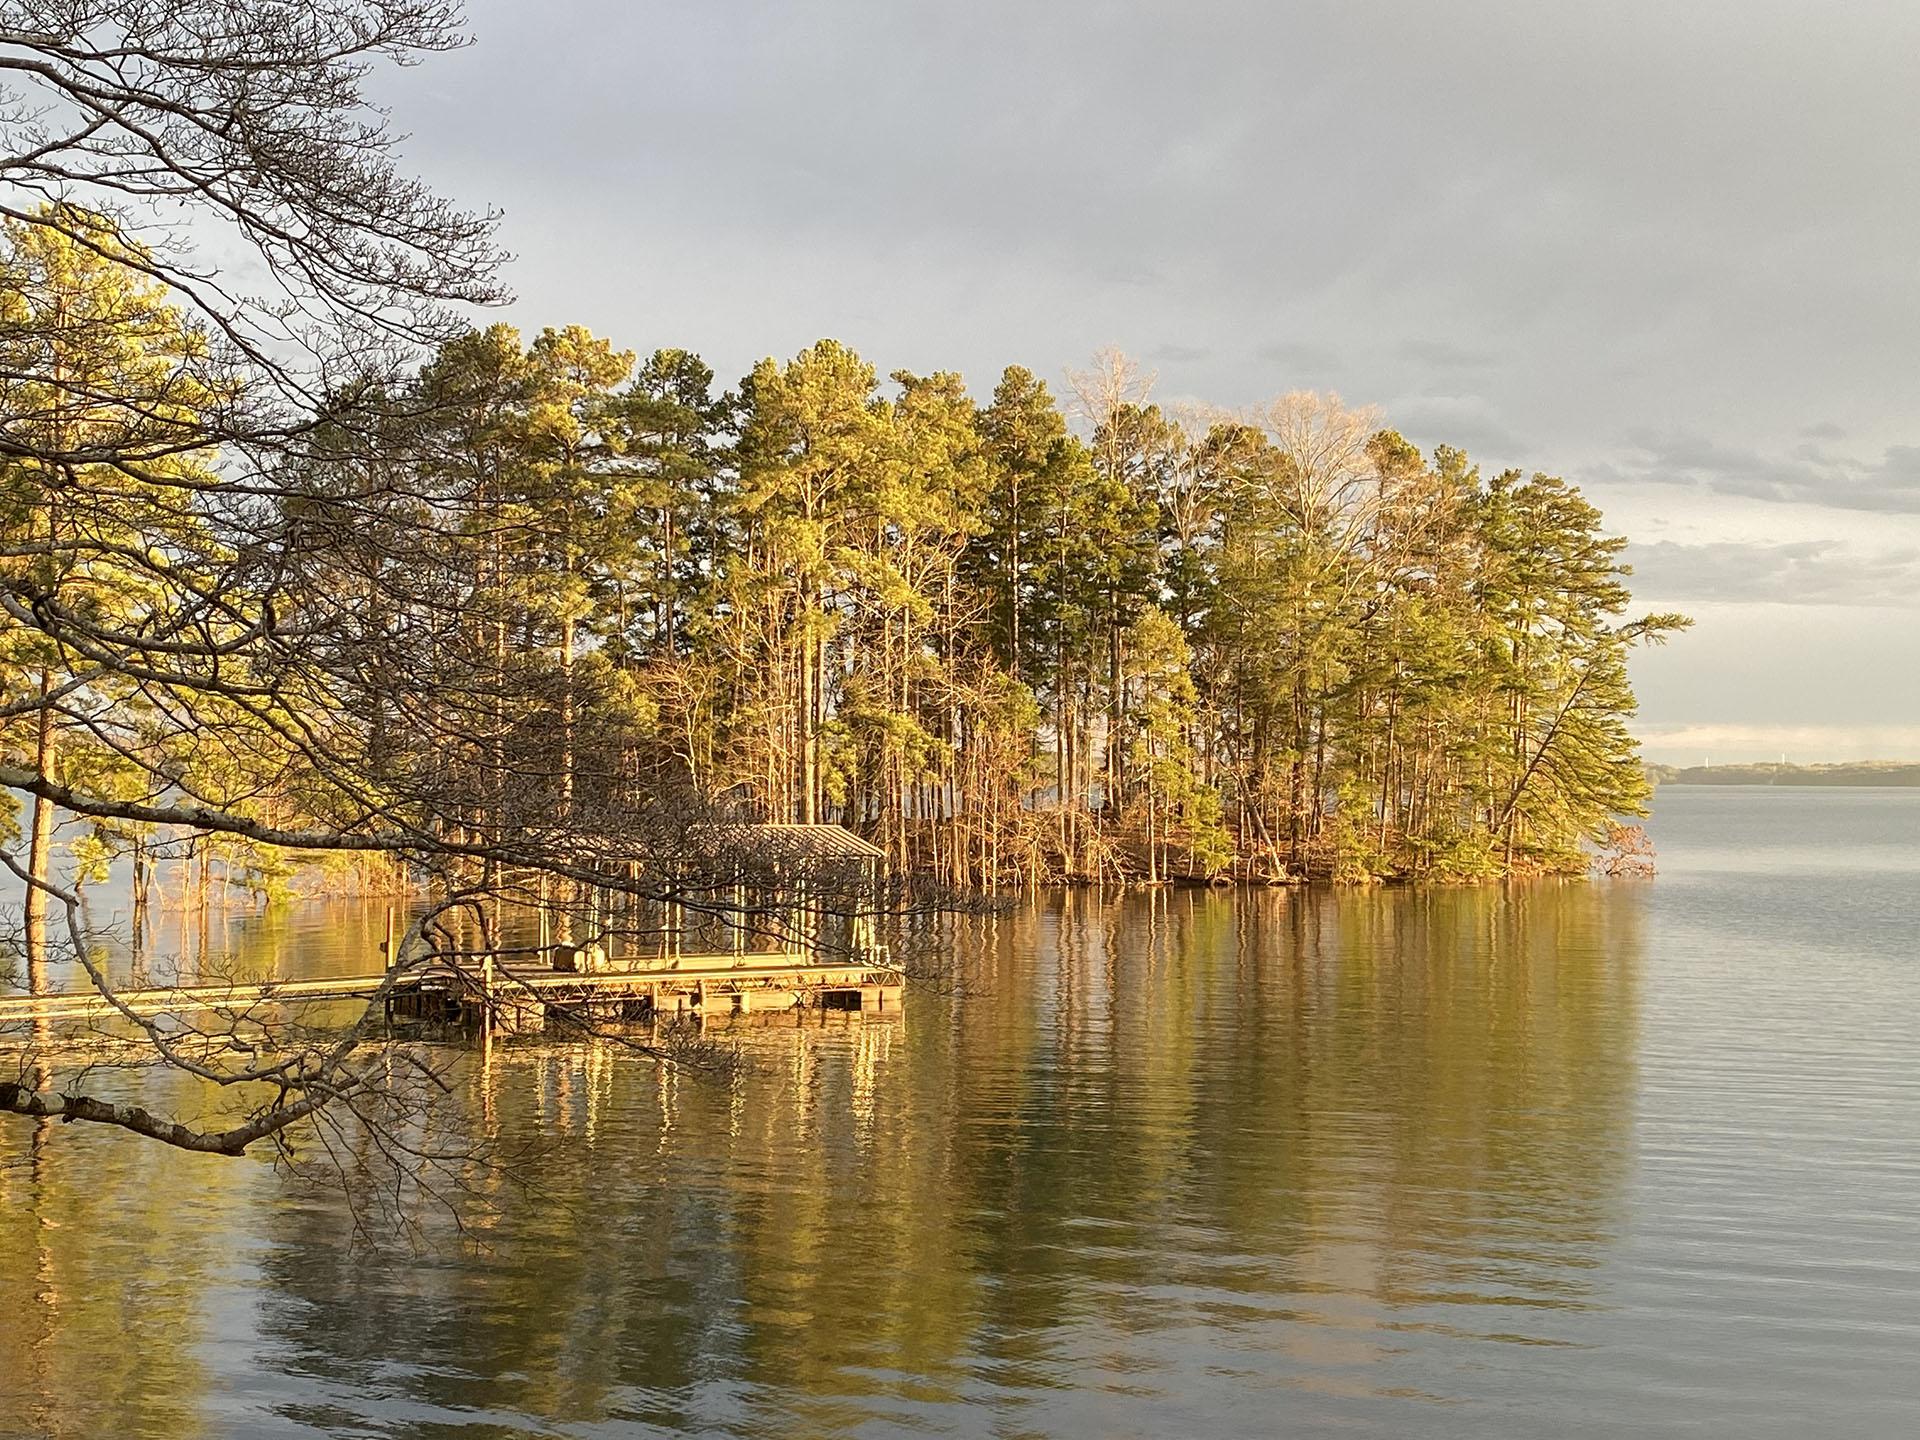 Dock and tree line at Lake Lanier